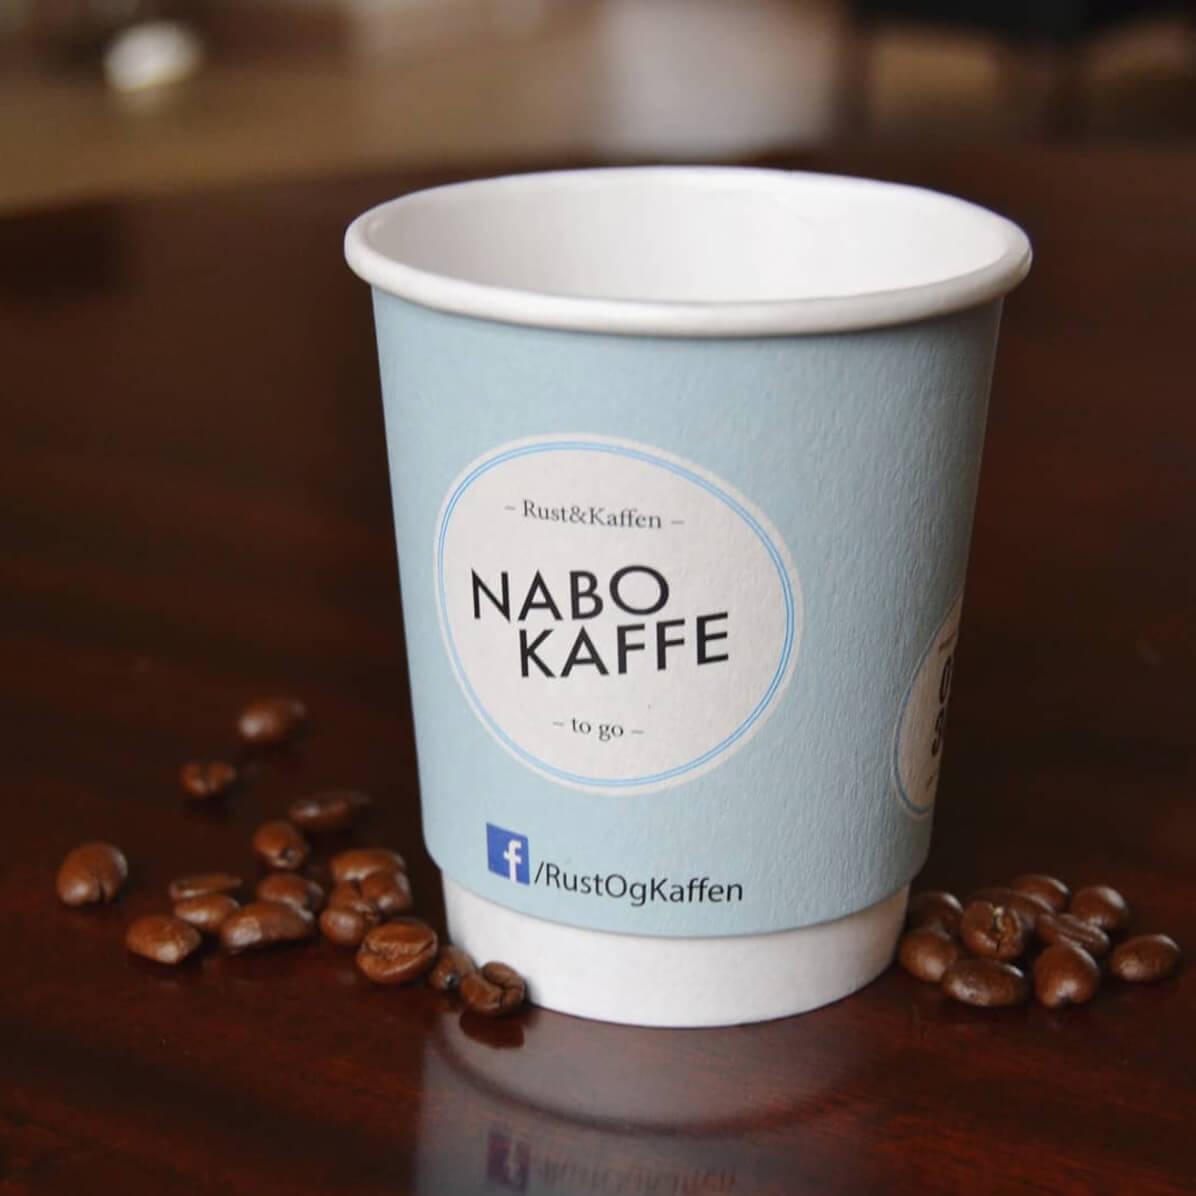 nabo kaffe papkrus med logo